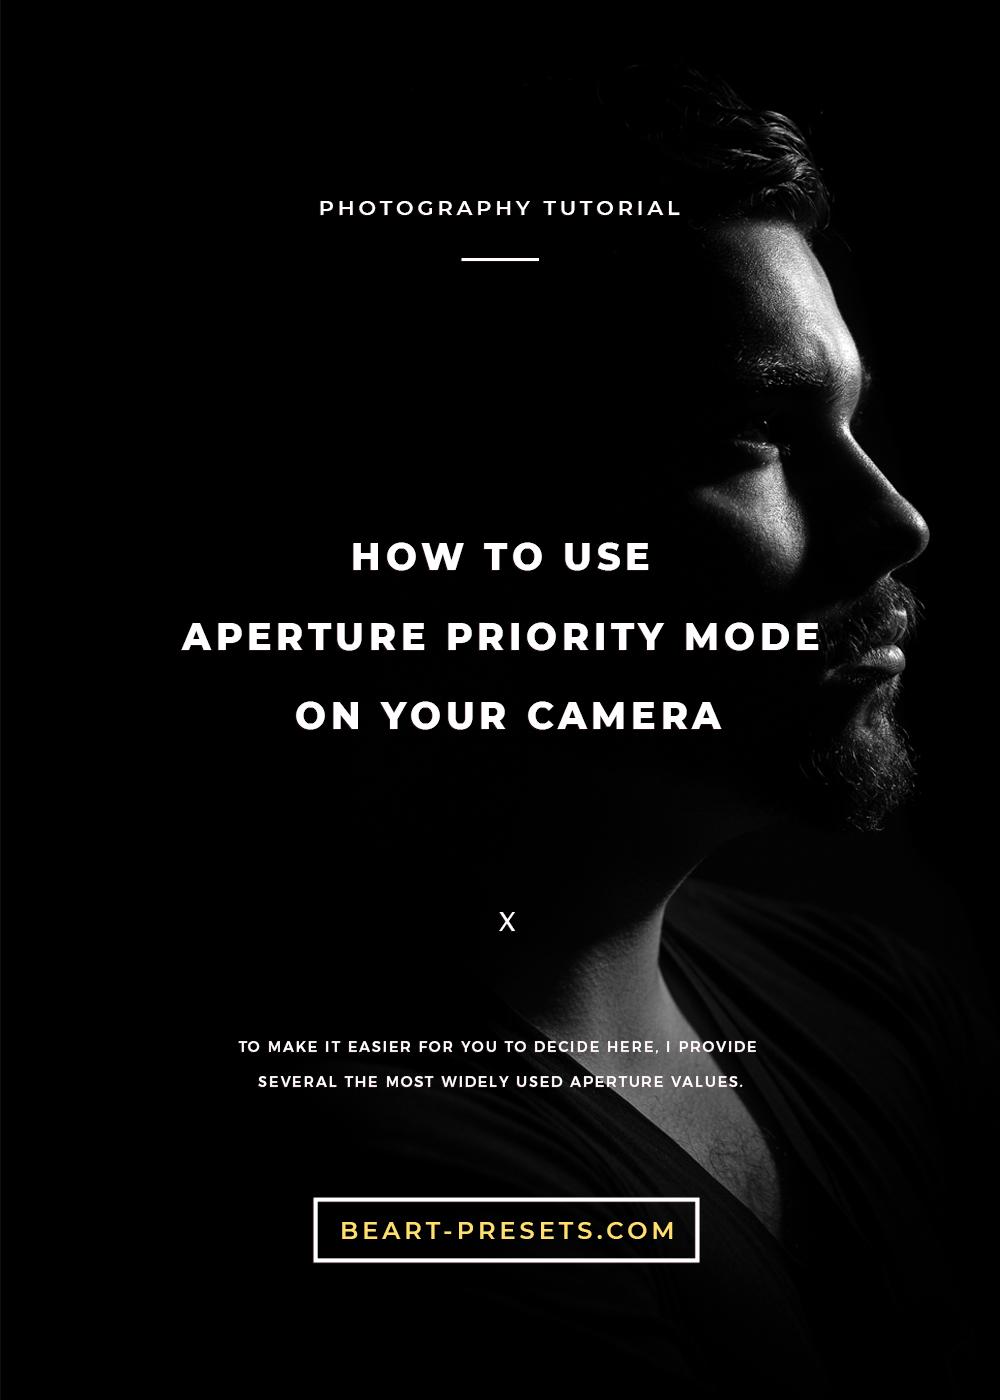 aperture priority mode in your camera